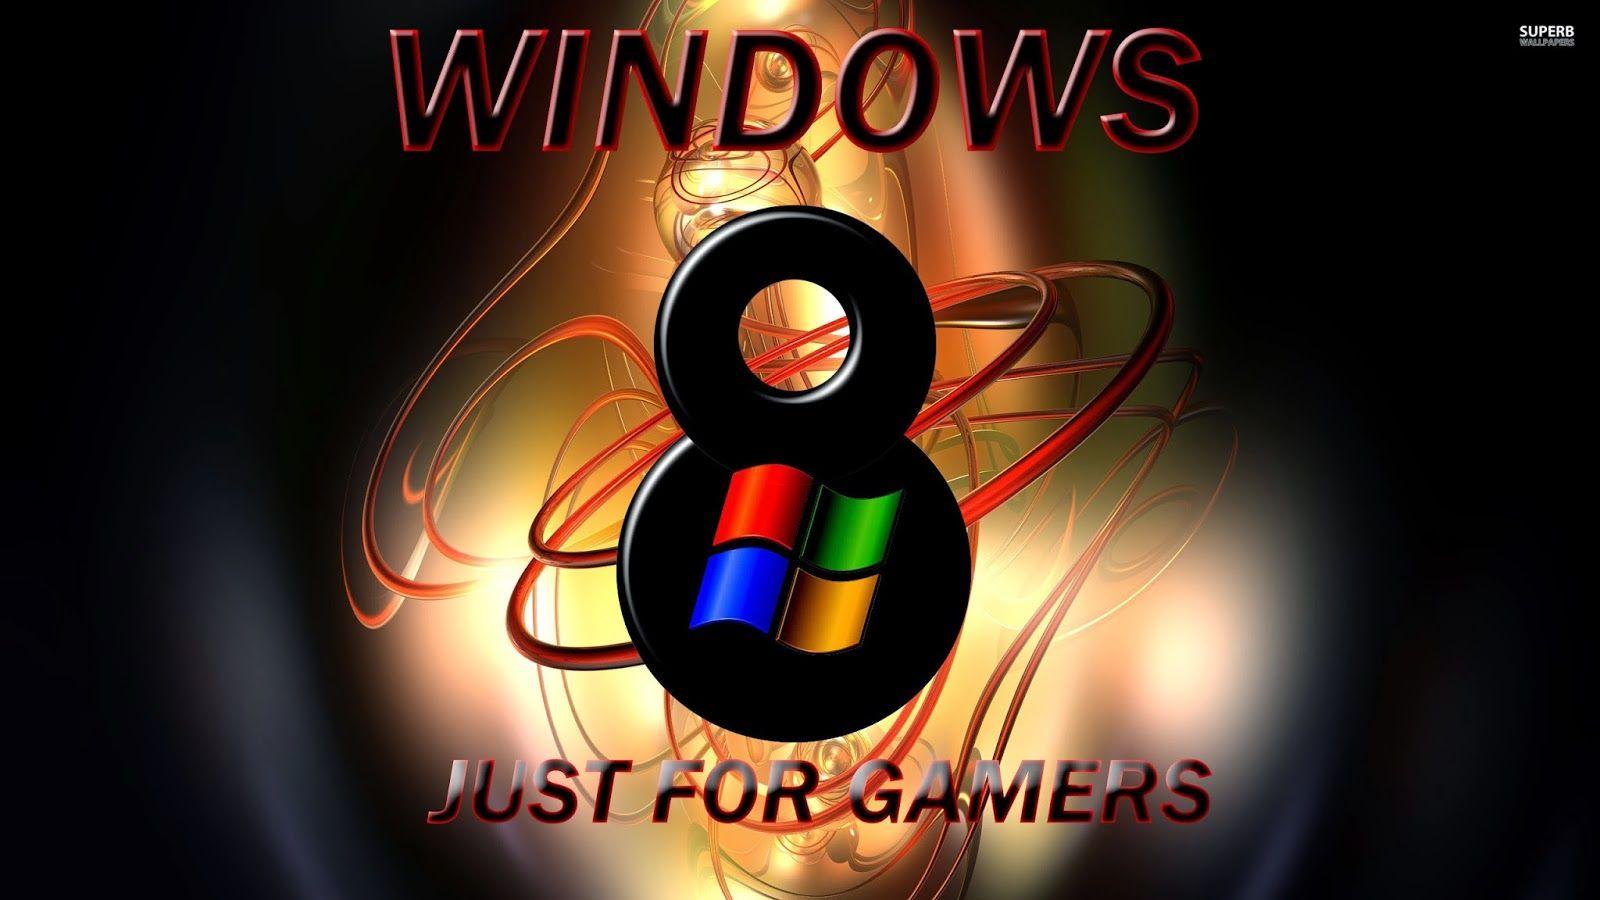 Windows 8 Hd Wallpapers Hd Wallpapers Blog Wallpaper Free Download Anime Wallpaper Wallpaper Pc